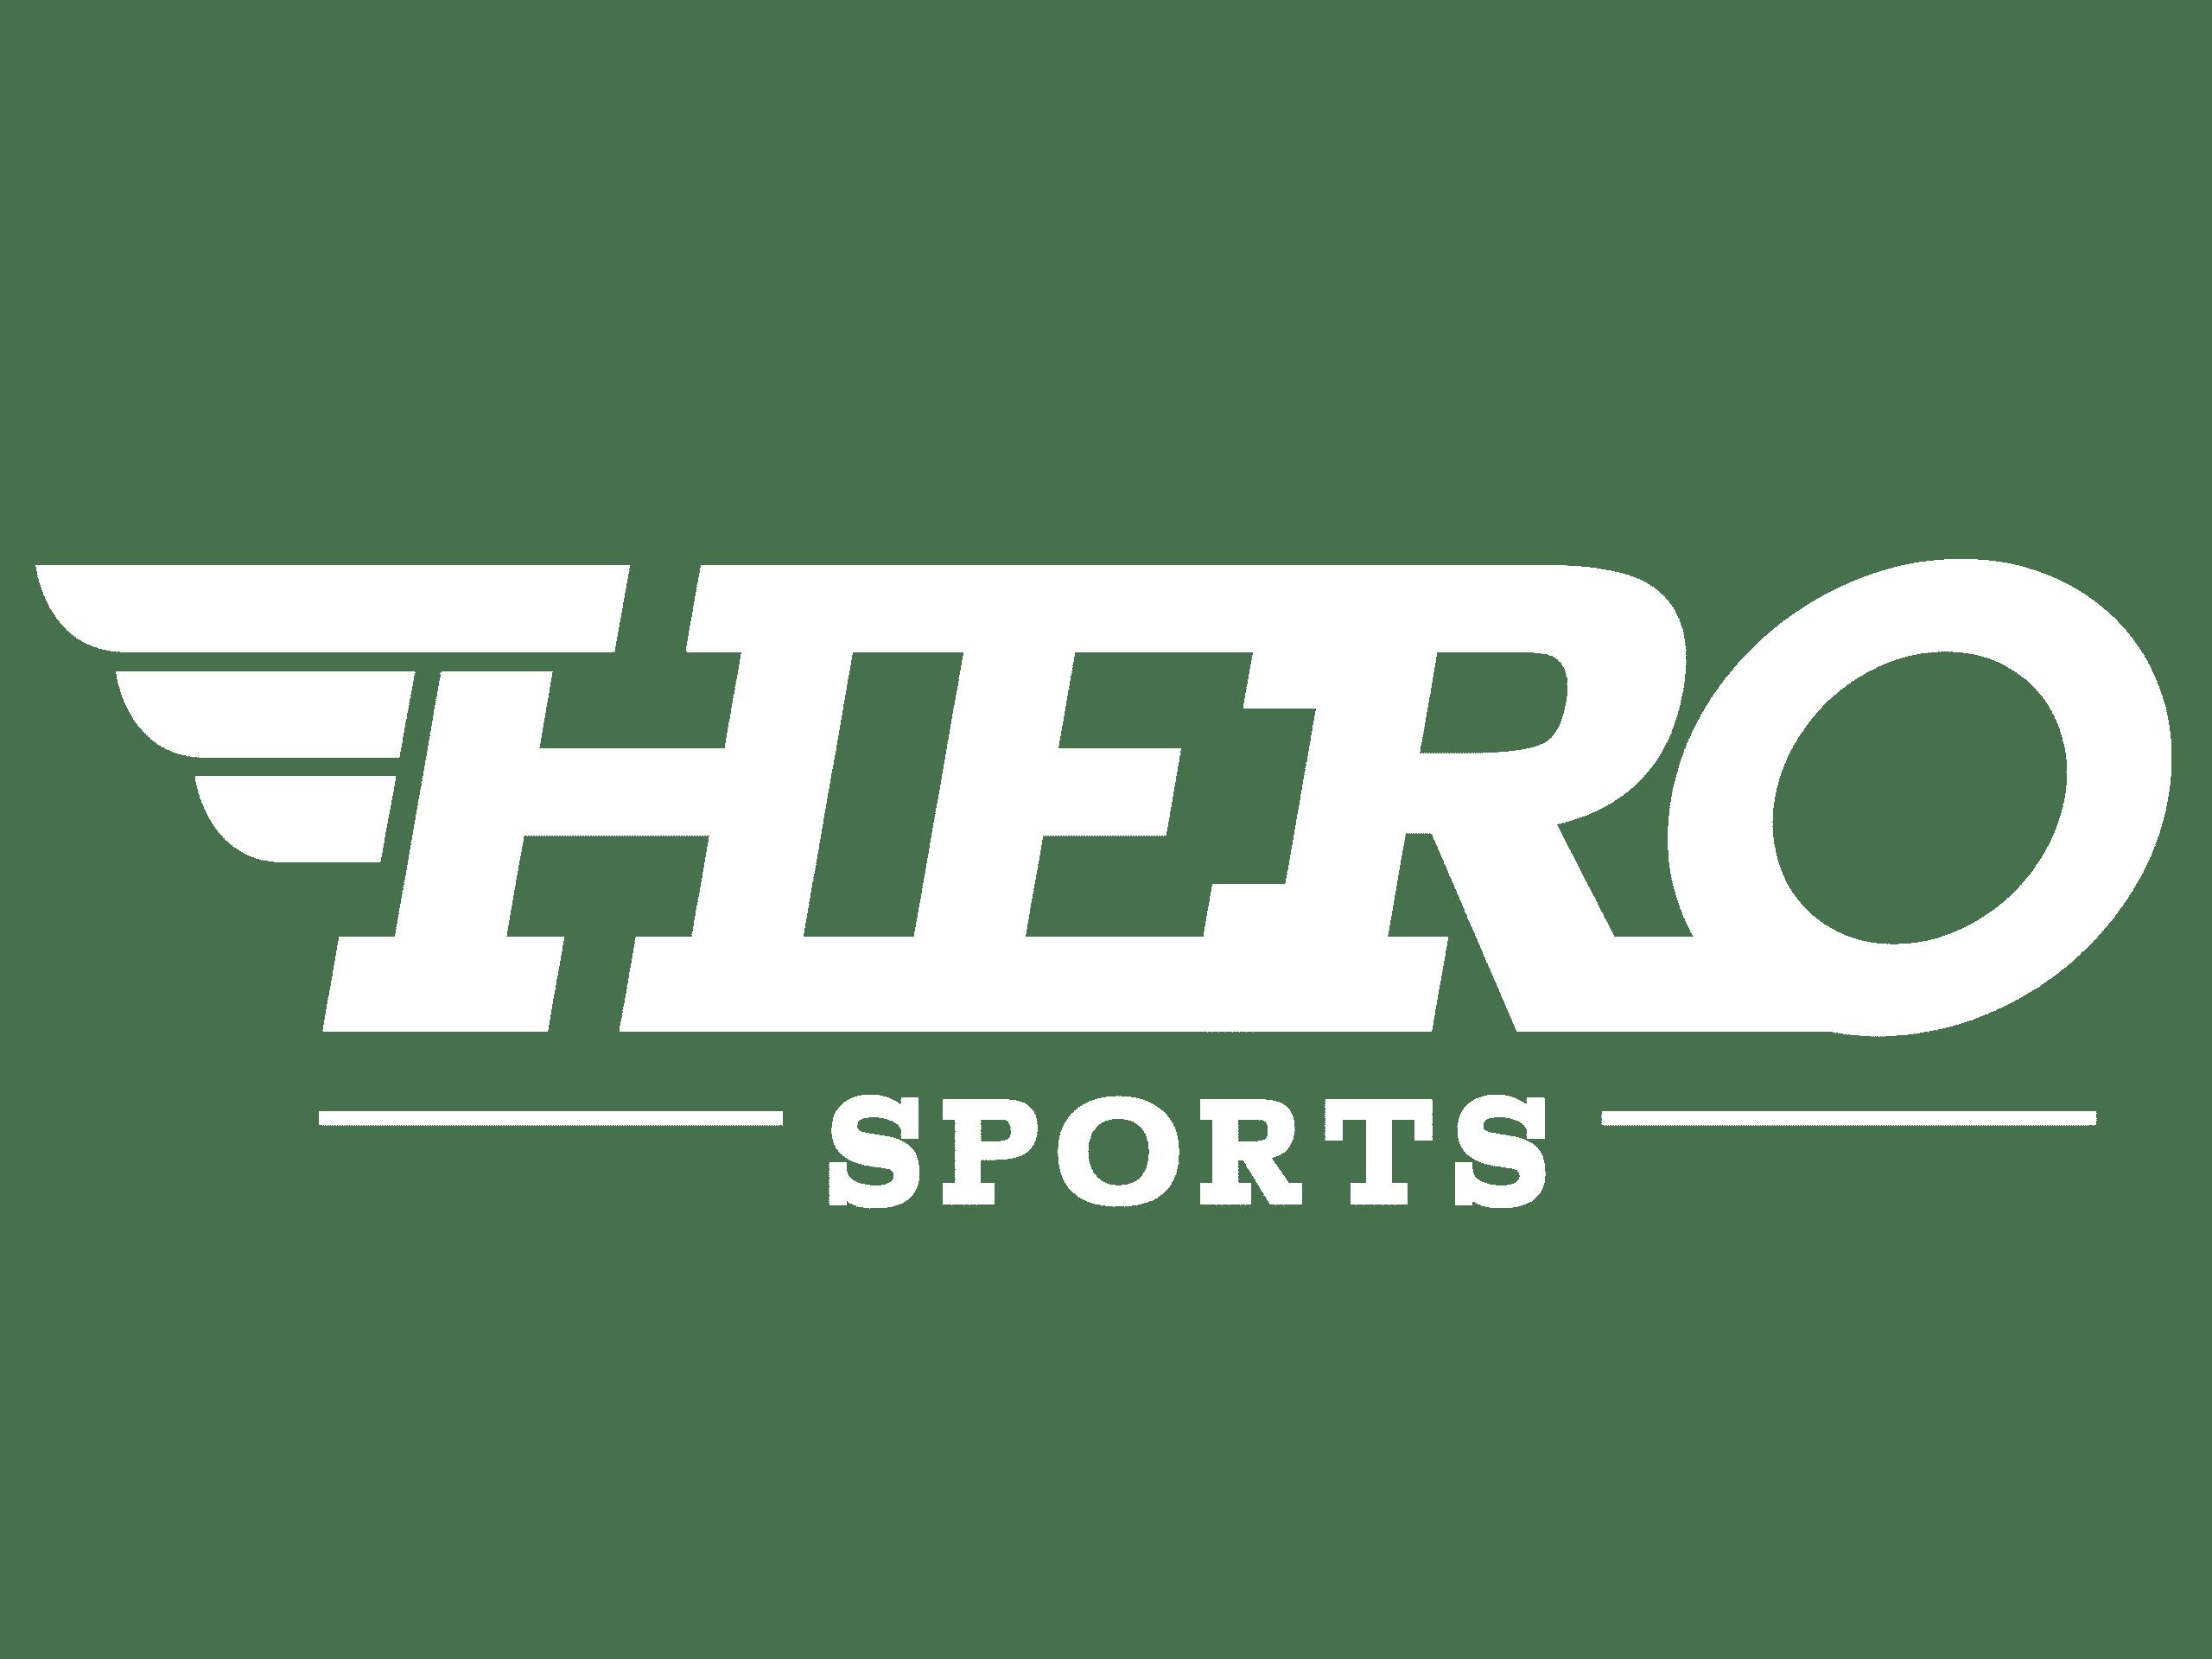 HERO Sports News